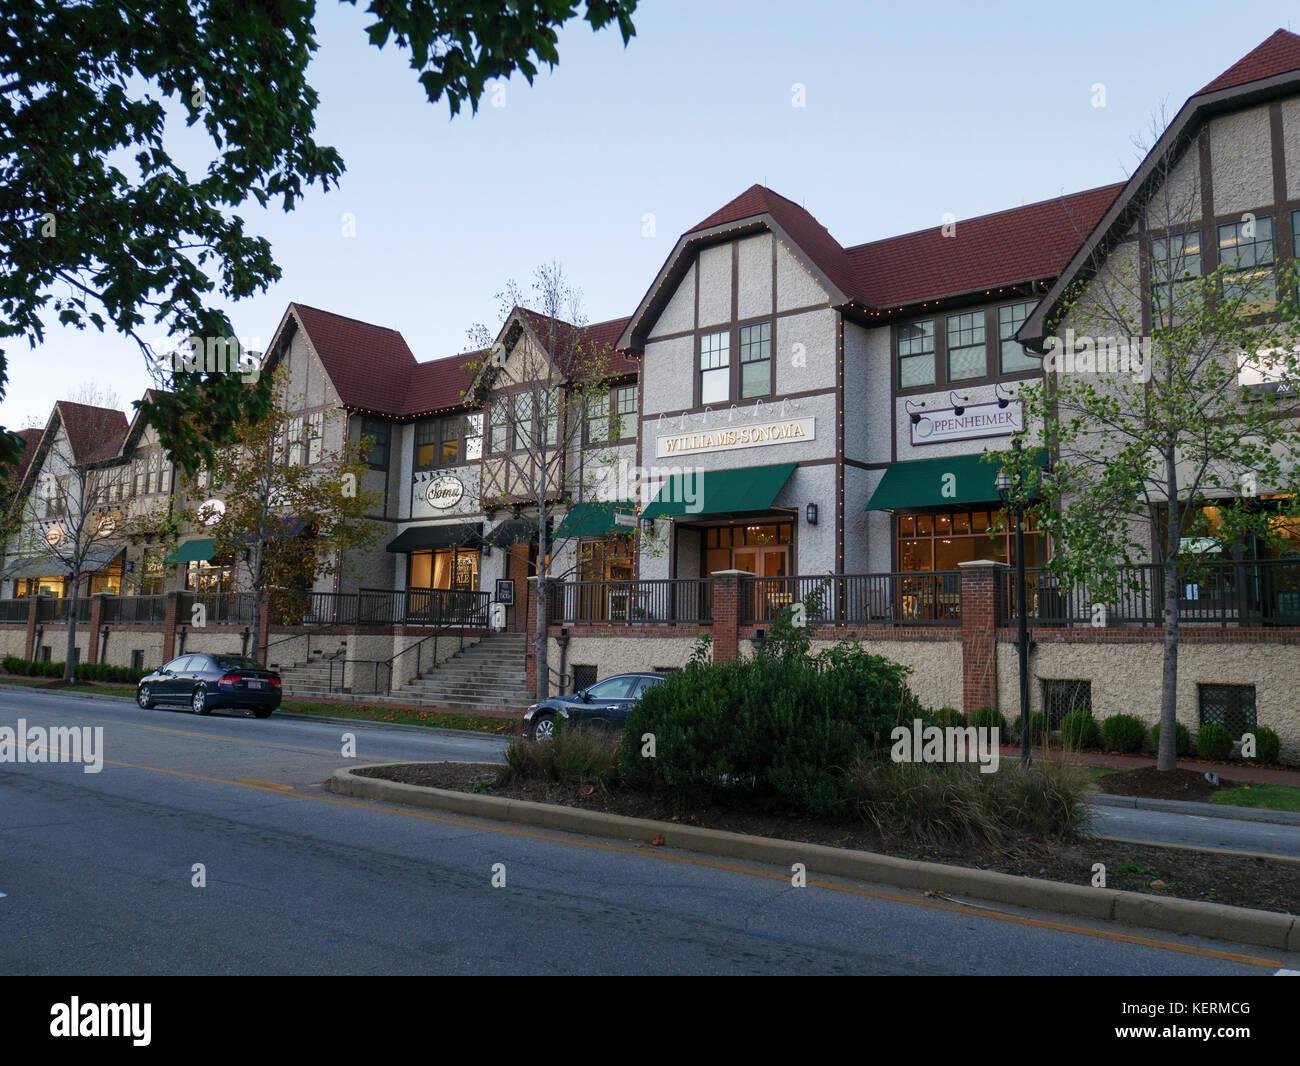 Retail shops, Biltmore Village, Asheville, North Carolina - Stock Image